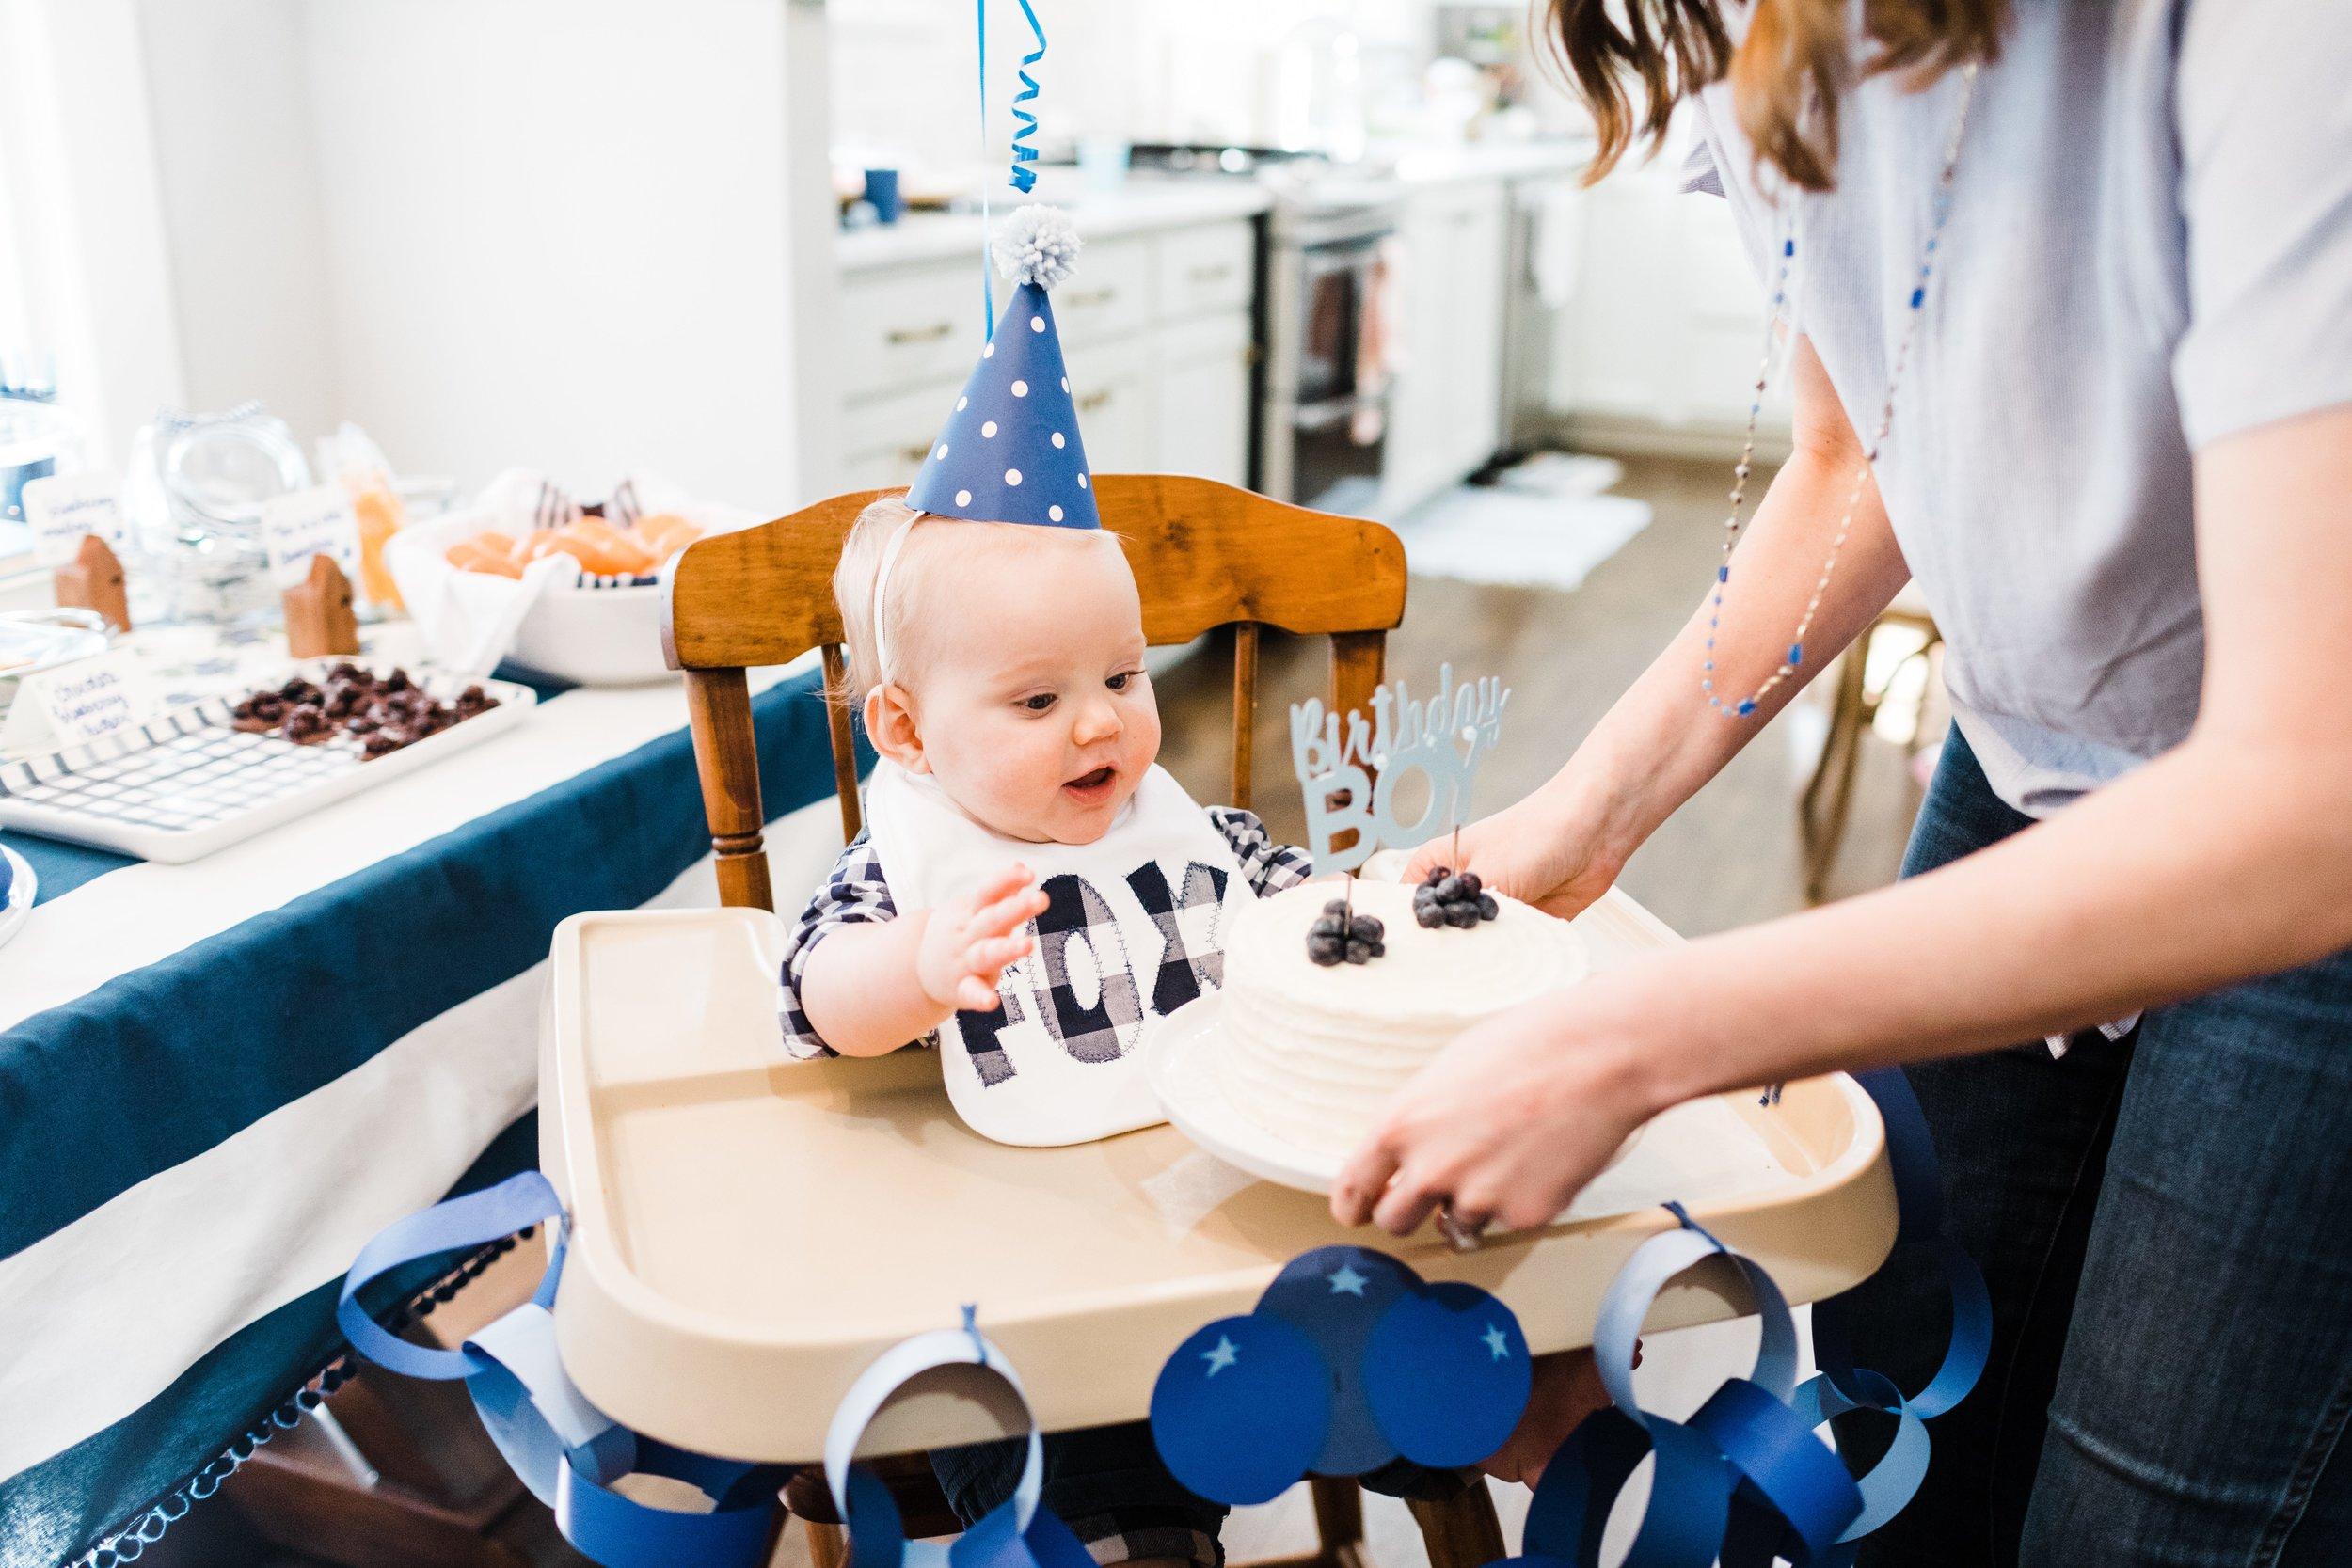 Blueberry themed first birthday smash cake